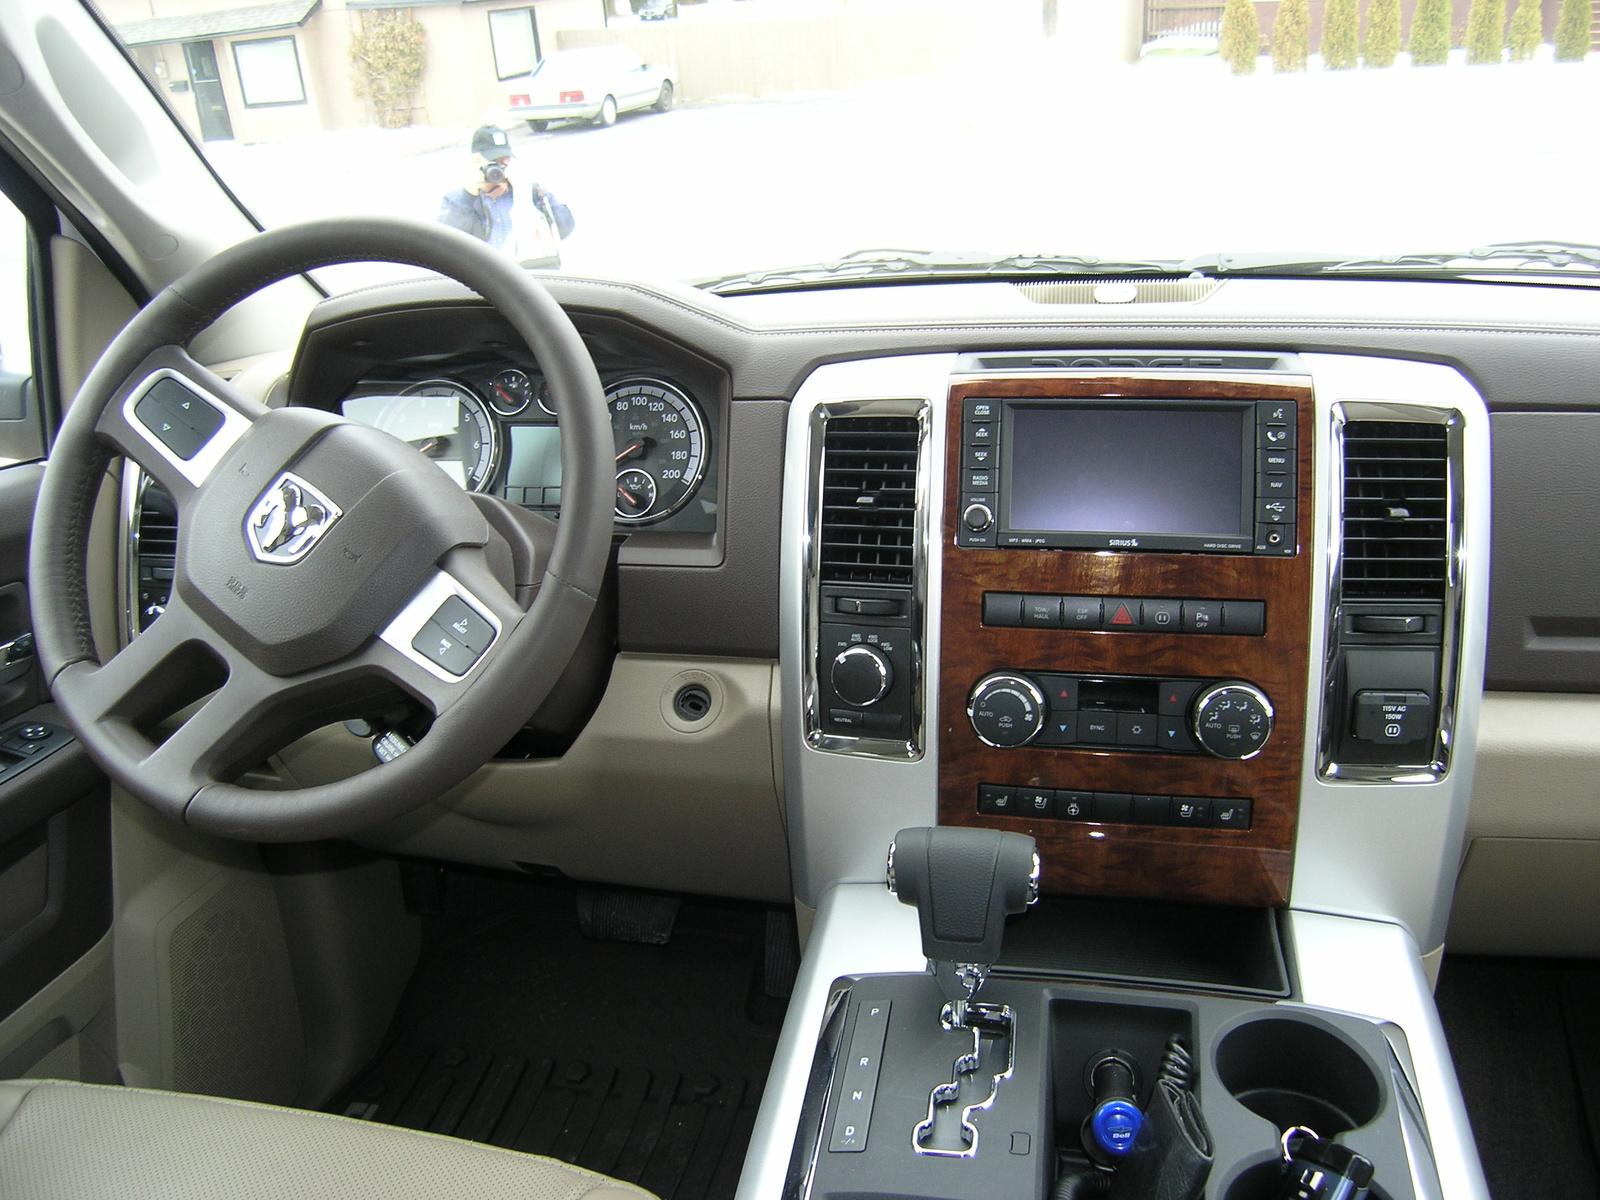 2006 Dodge Ram 1500 Interior